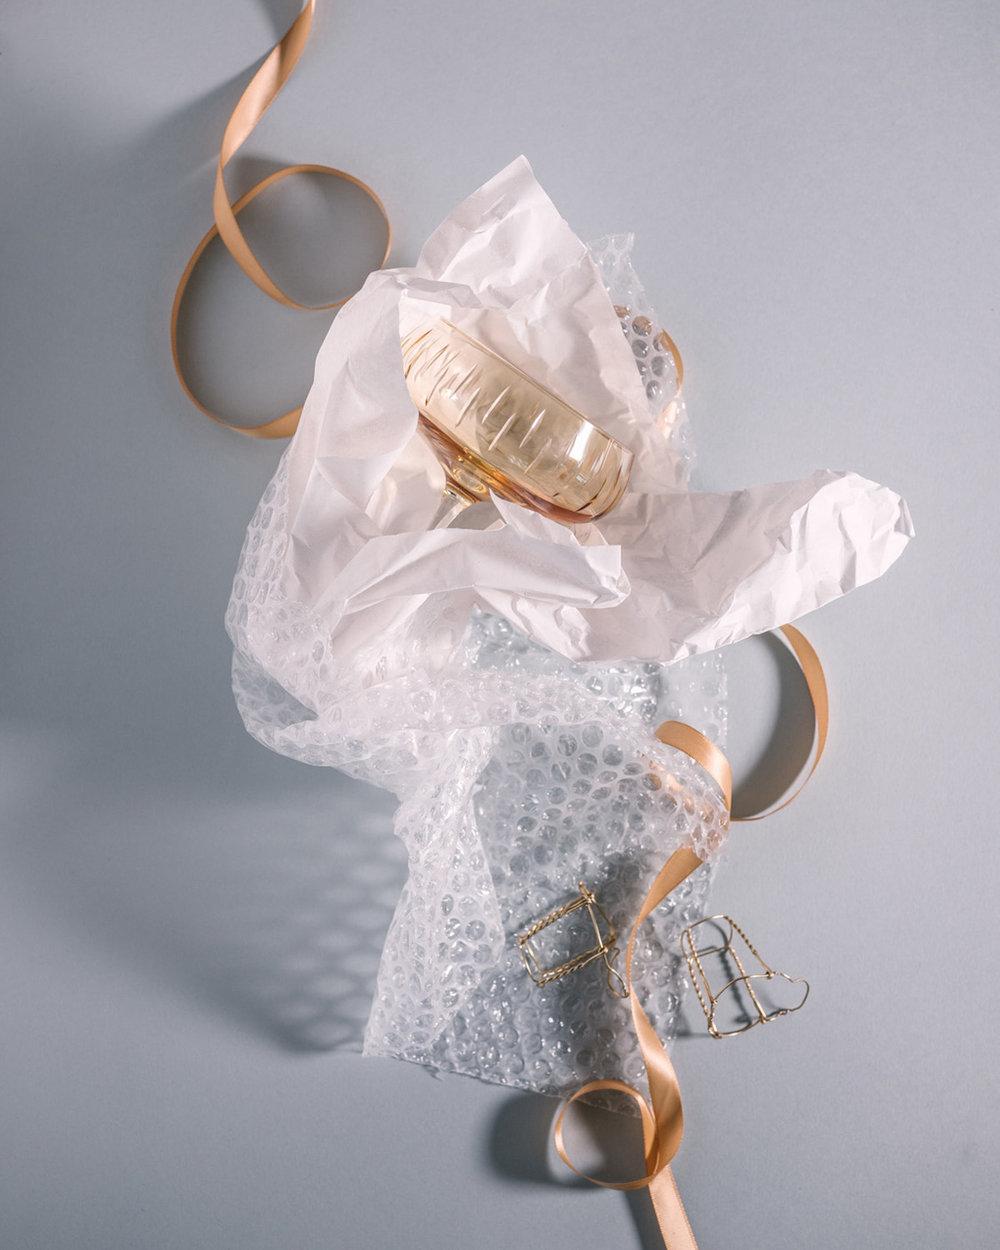 louise roe champagne glass krystall produktfoto mats dreyer fotograf oslo norge stylist interior